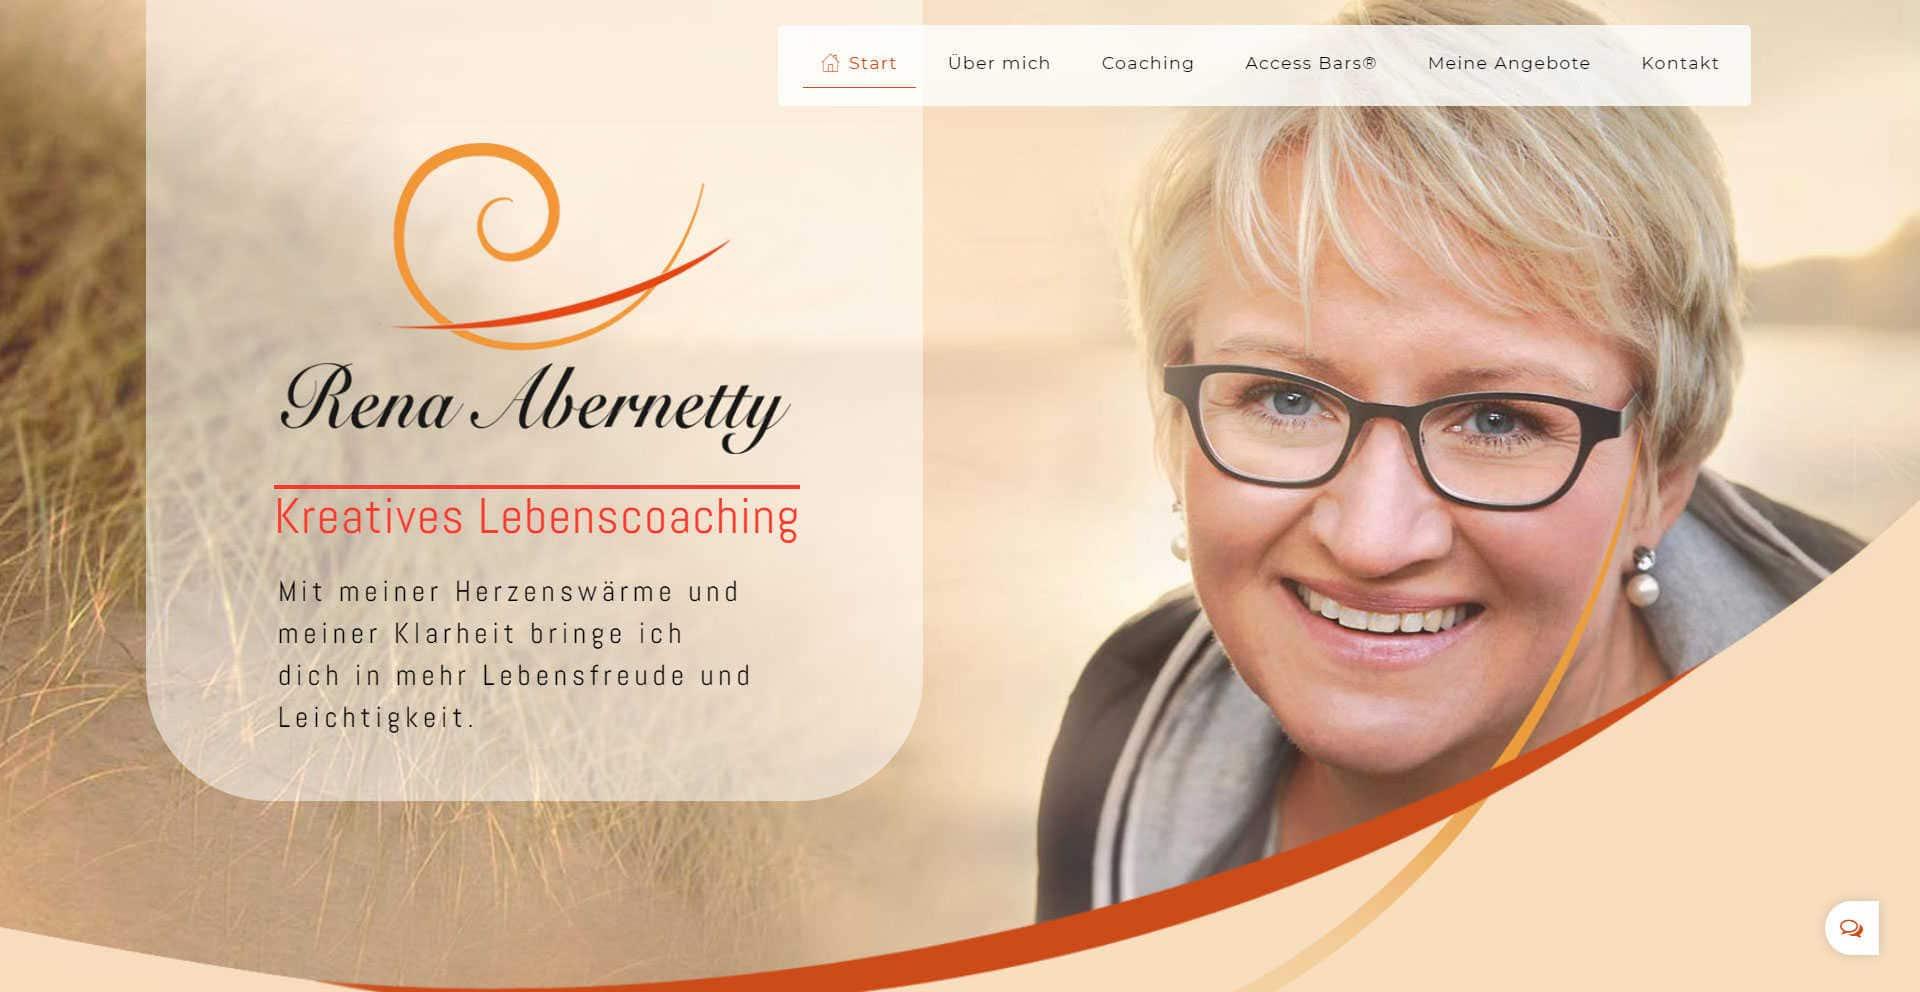 Rena Abernetty - Life Coach - Münster